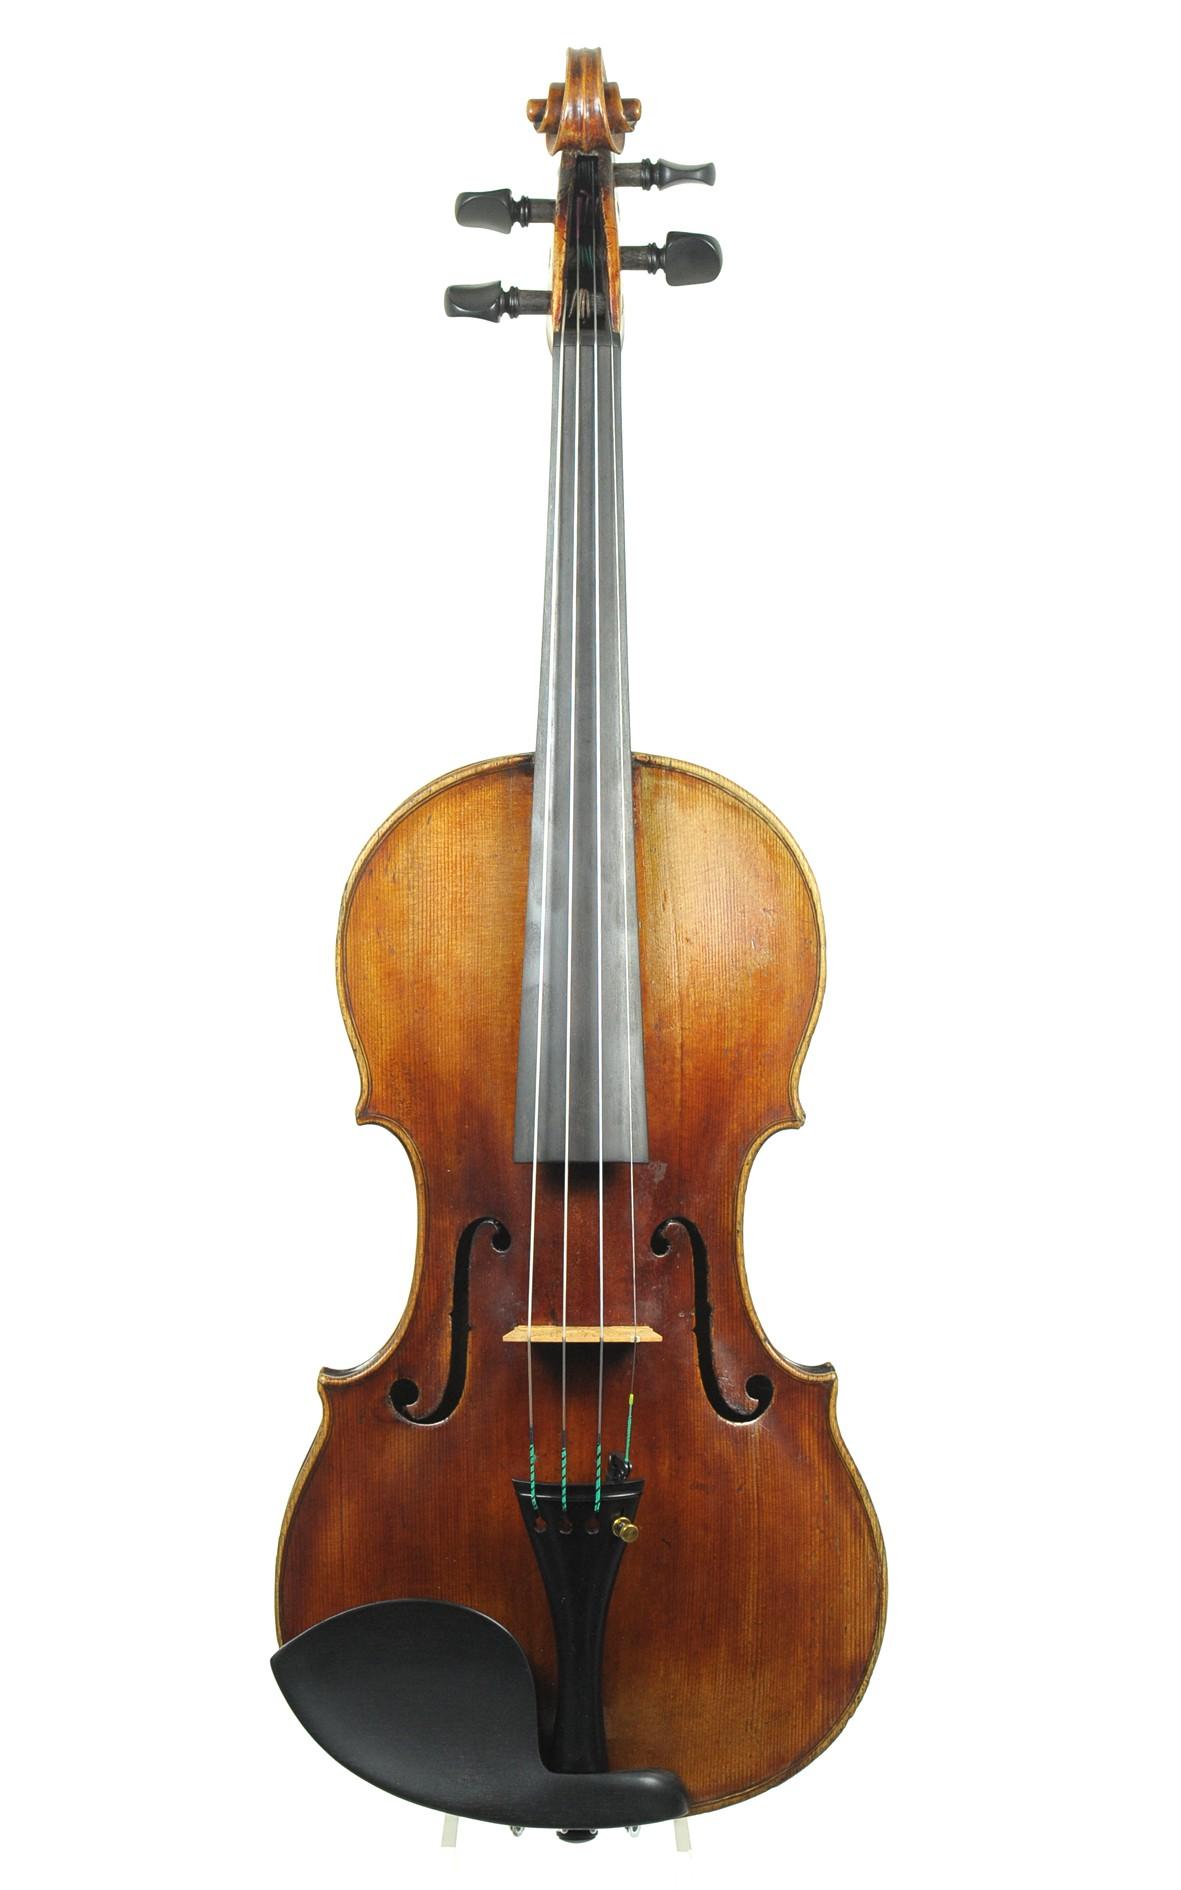 Fine 1789 Violin by Franz Knitl, Freising - top